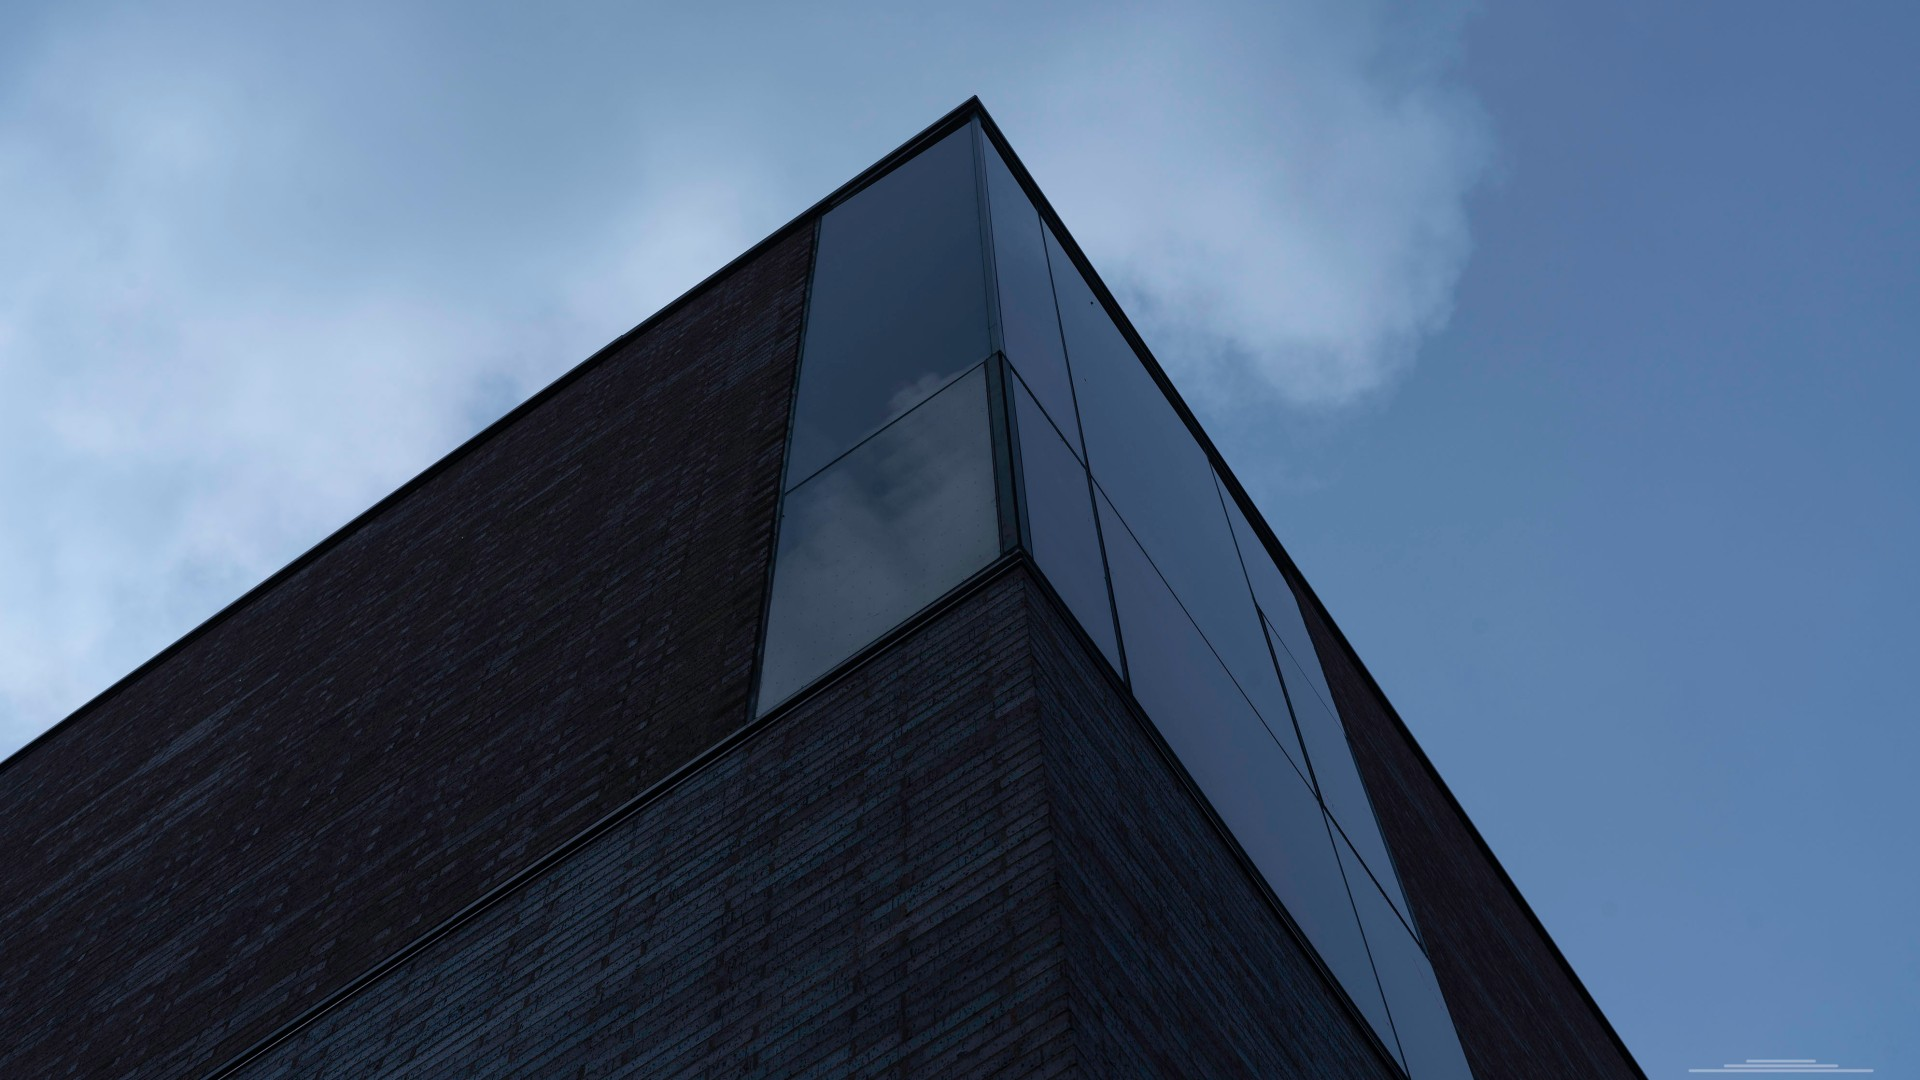 Brick and Glass slab building | ian.photos